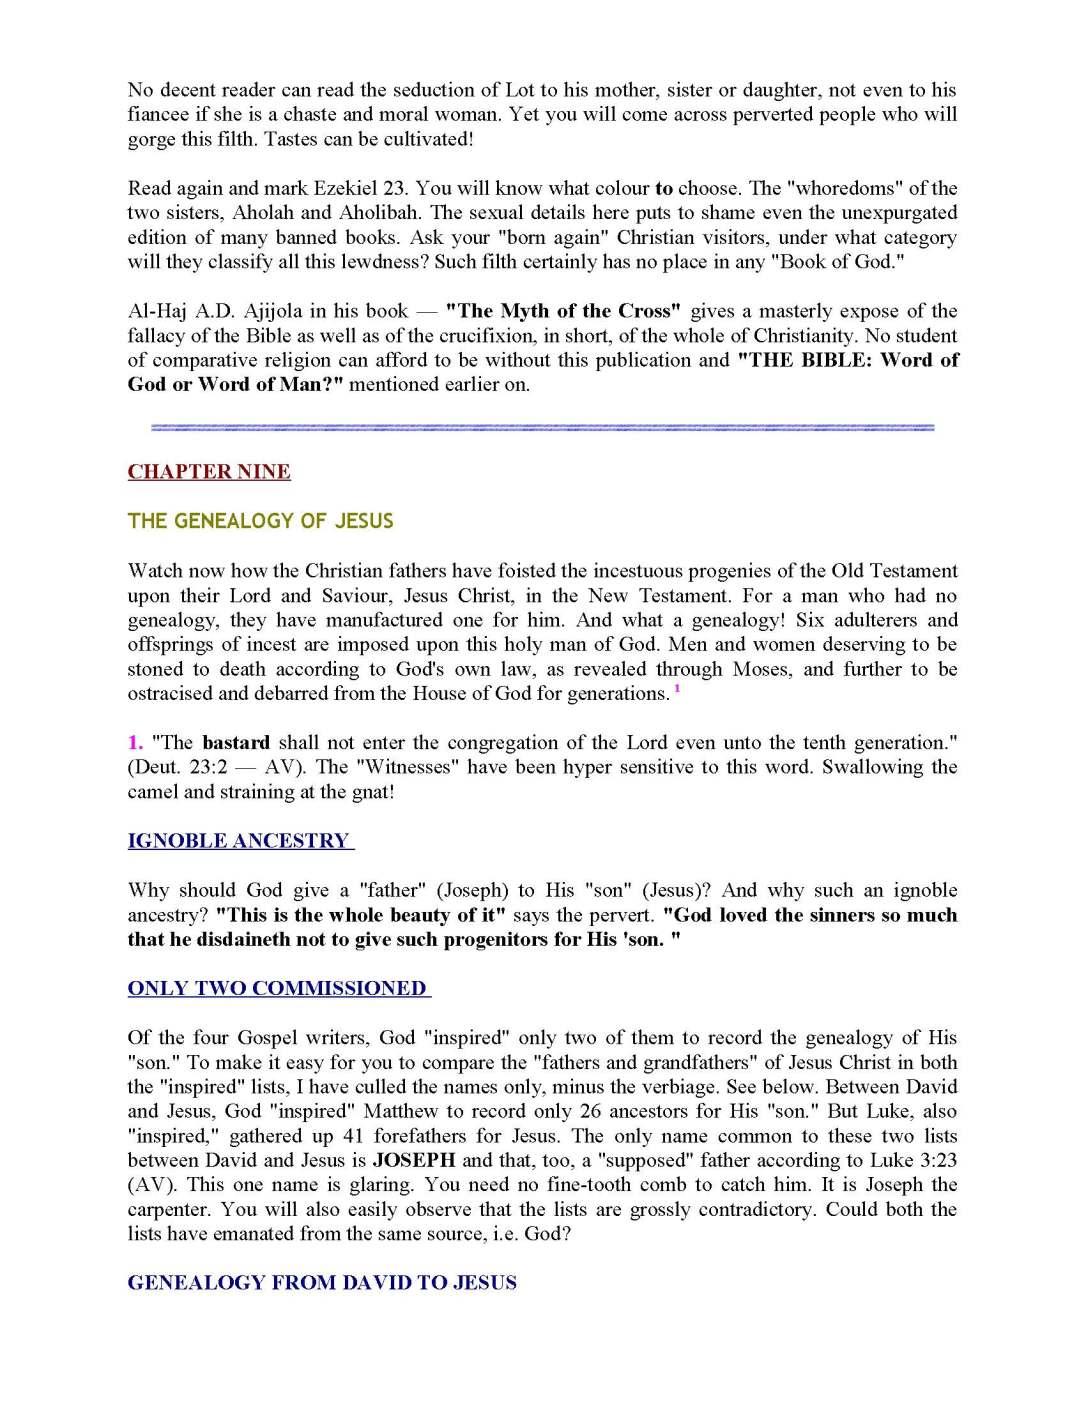 Is The Bible Gods Word [deedat]_Page_38